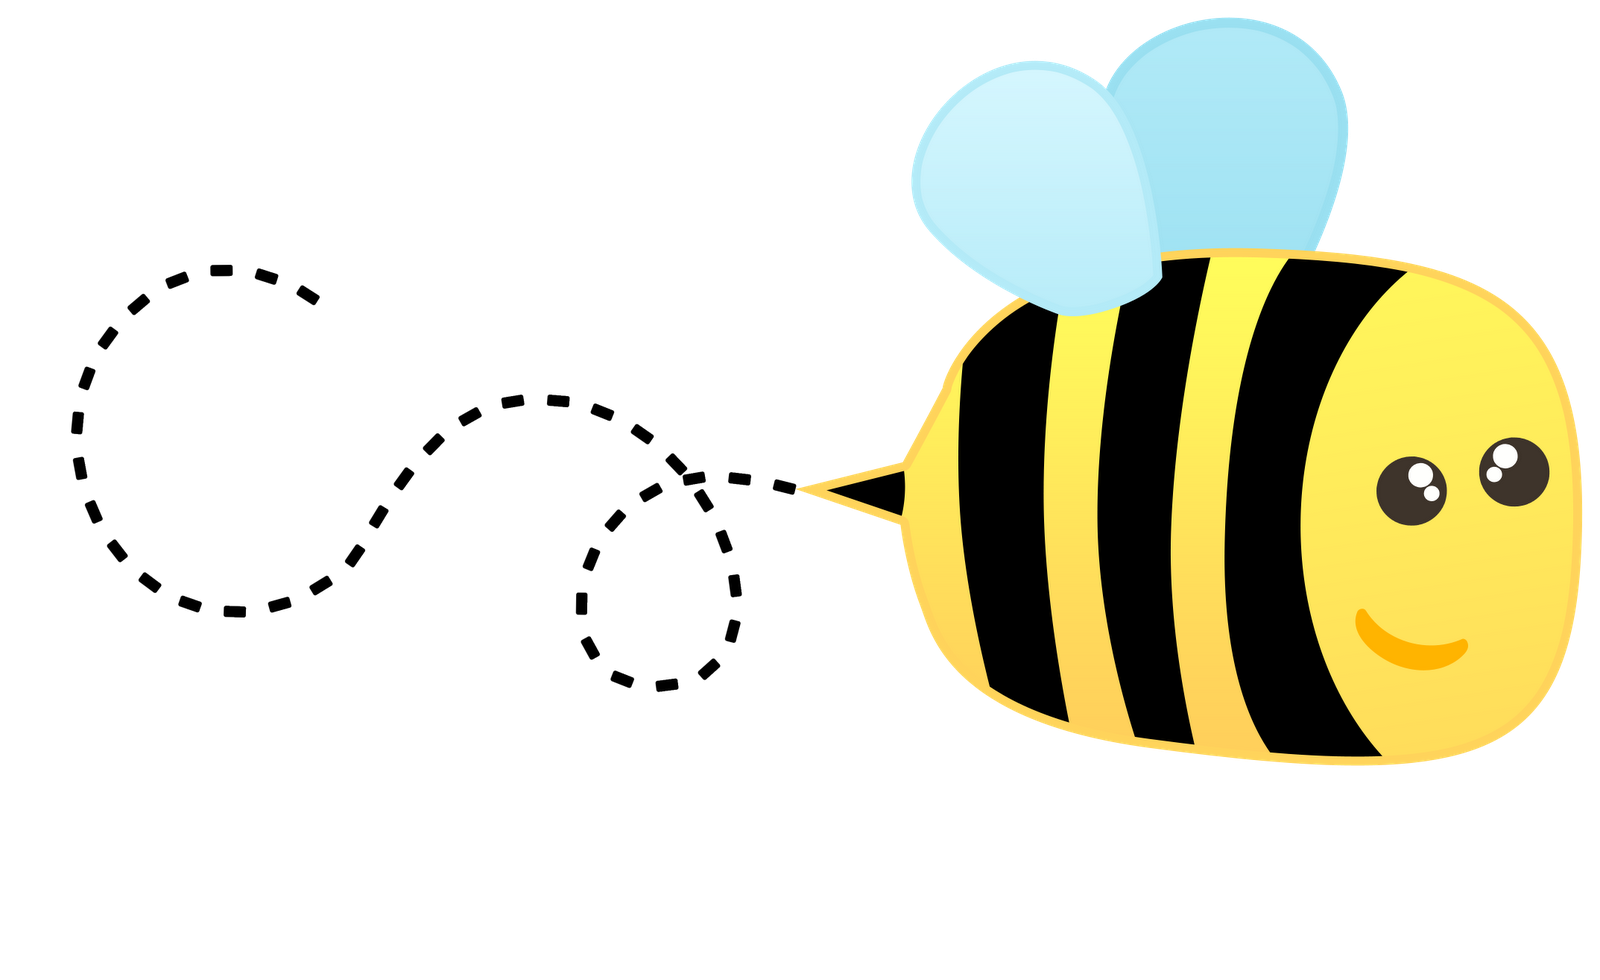 Bee clipart flying. Bee clipart flying. Free cliparts download clip